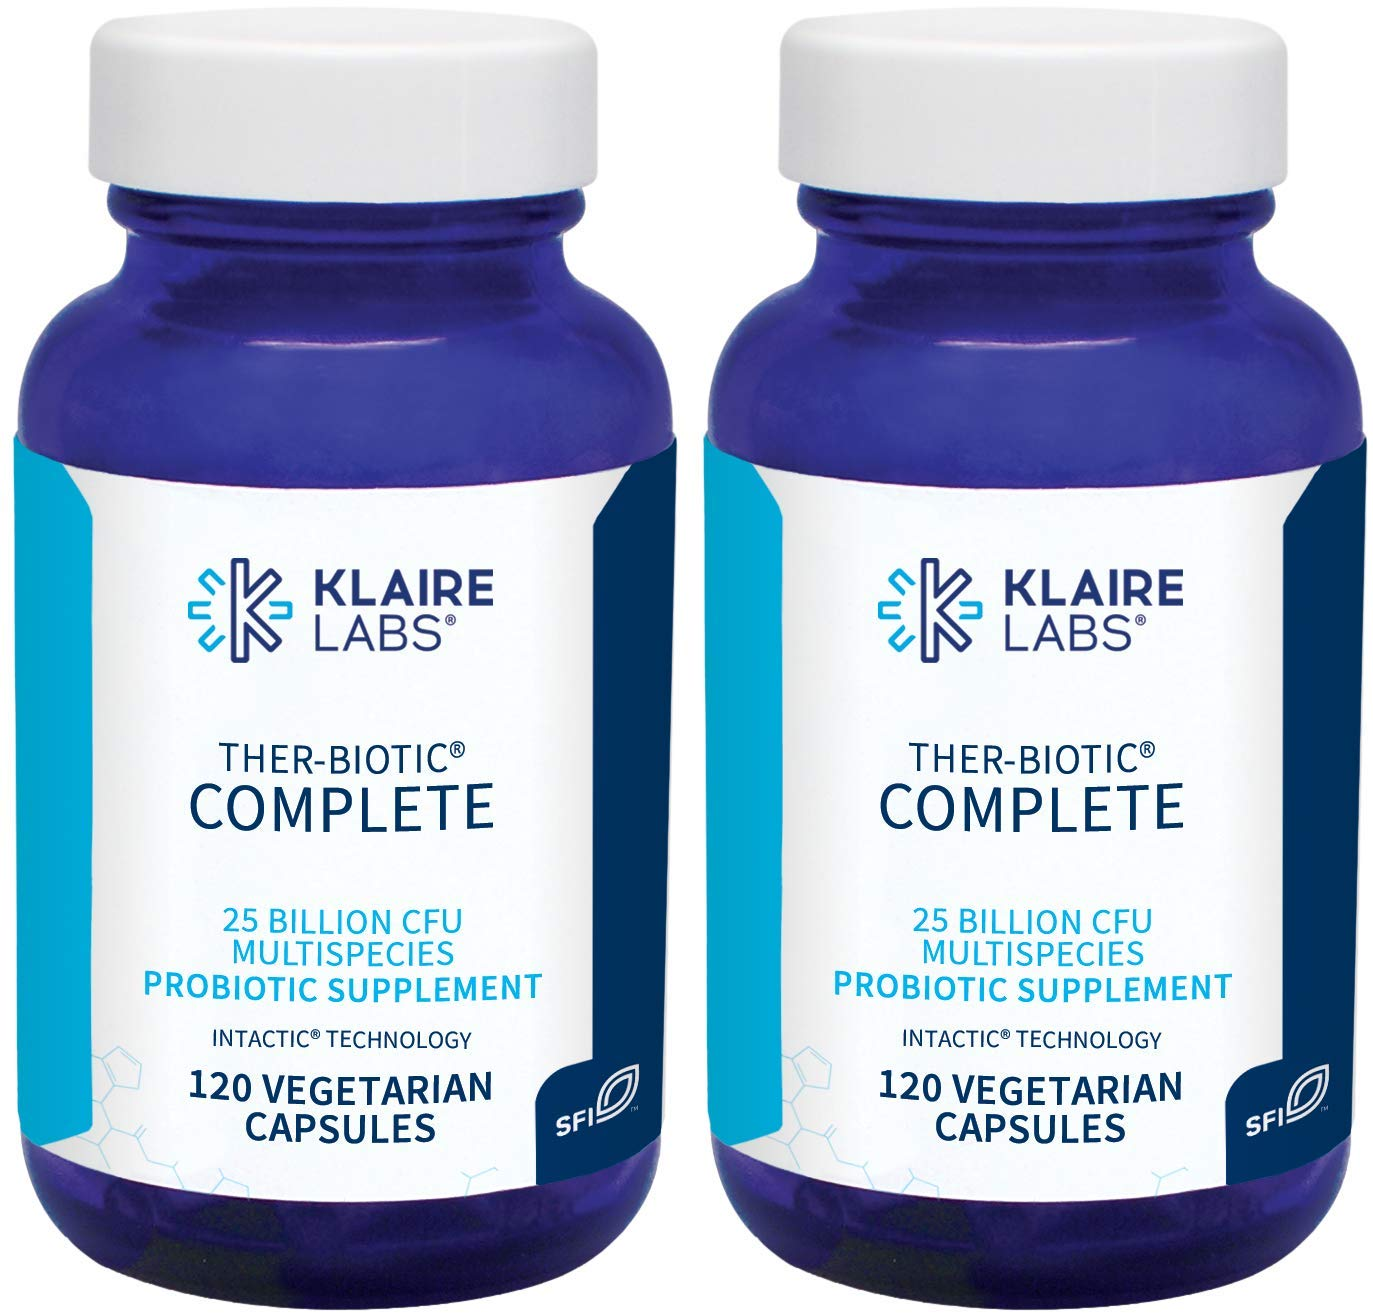 Klaire Labs Ther-Biotic Complete, 120 Vegetarian Capsules (2 Pack)